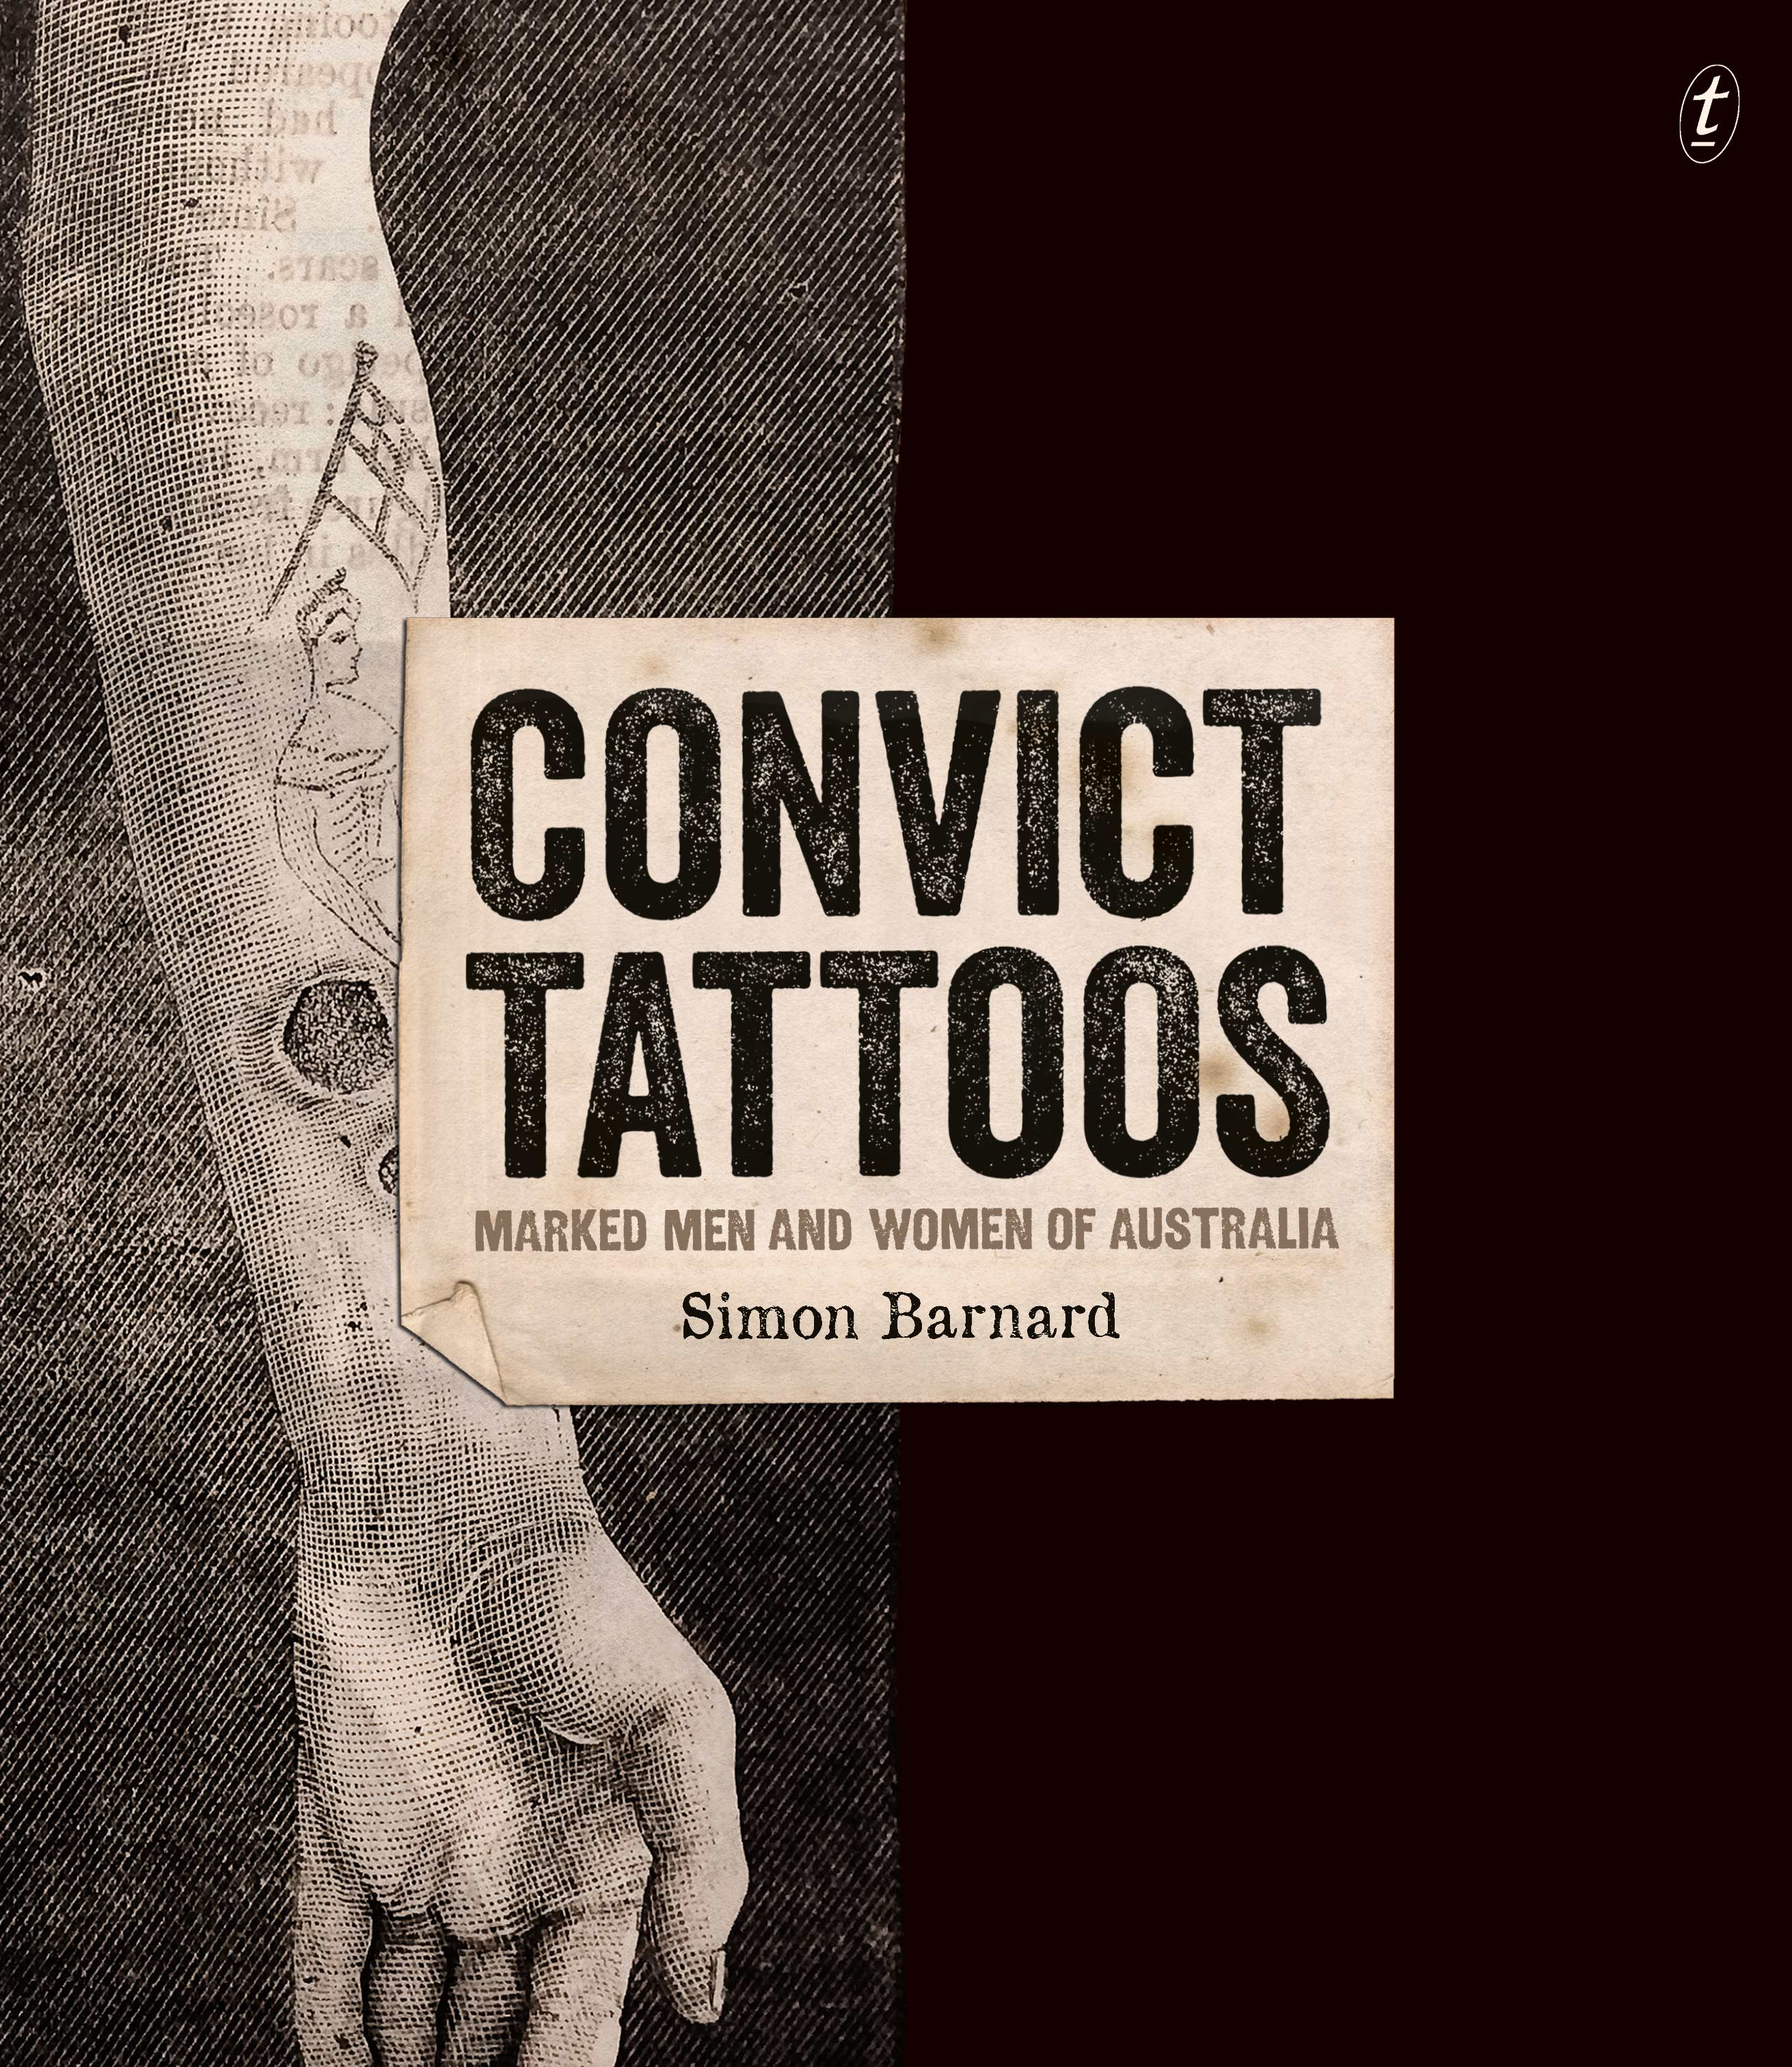 6e3e548c22a4d Share this bookshareHigh resolution coverpicturePreview this bookbooksView  book rightsnotepad. Convict Tattoos